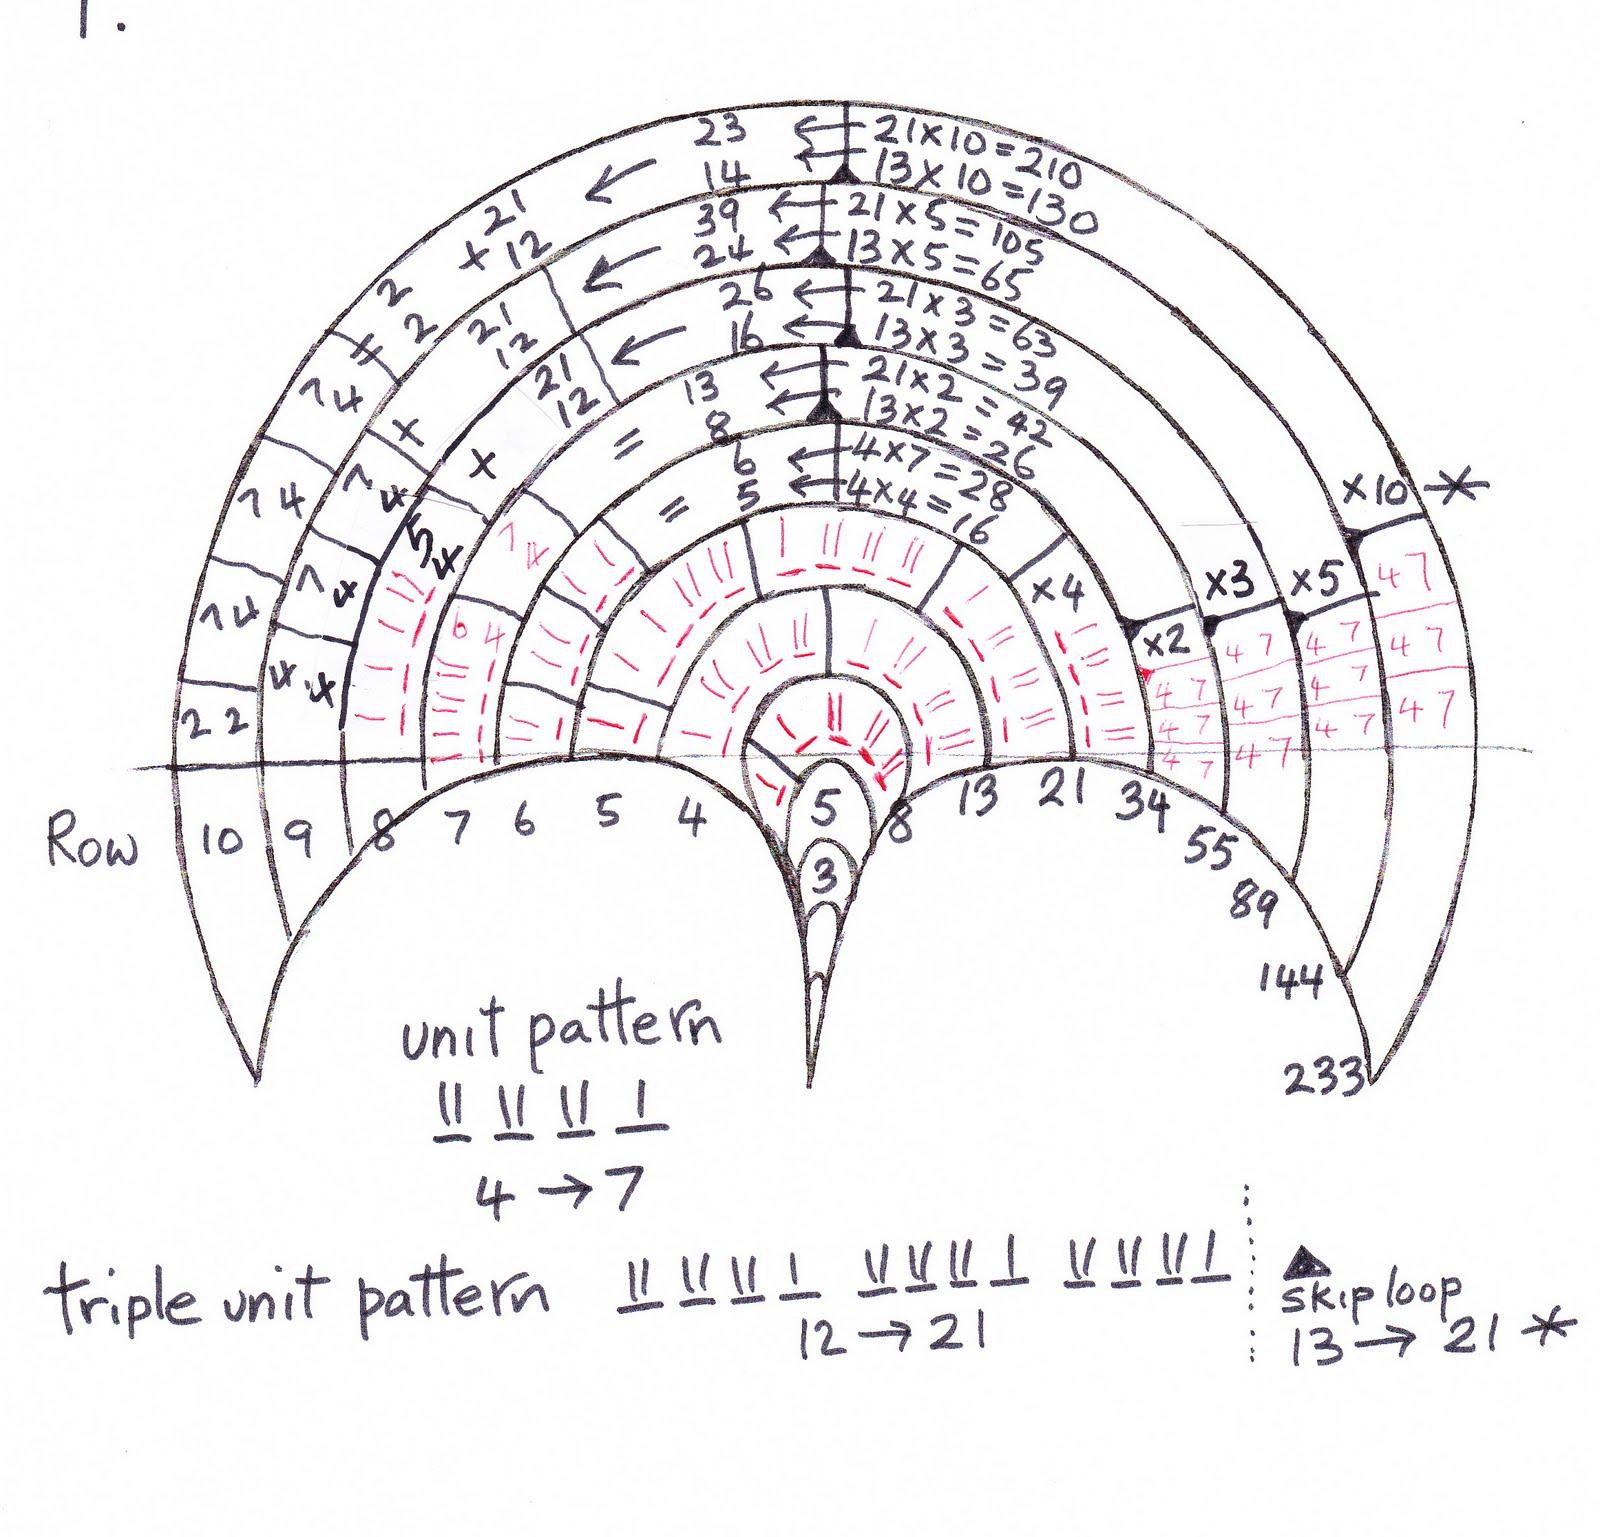 biomathcraft: Pattern 1 for